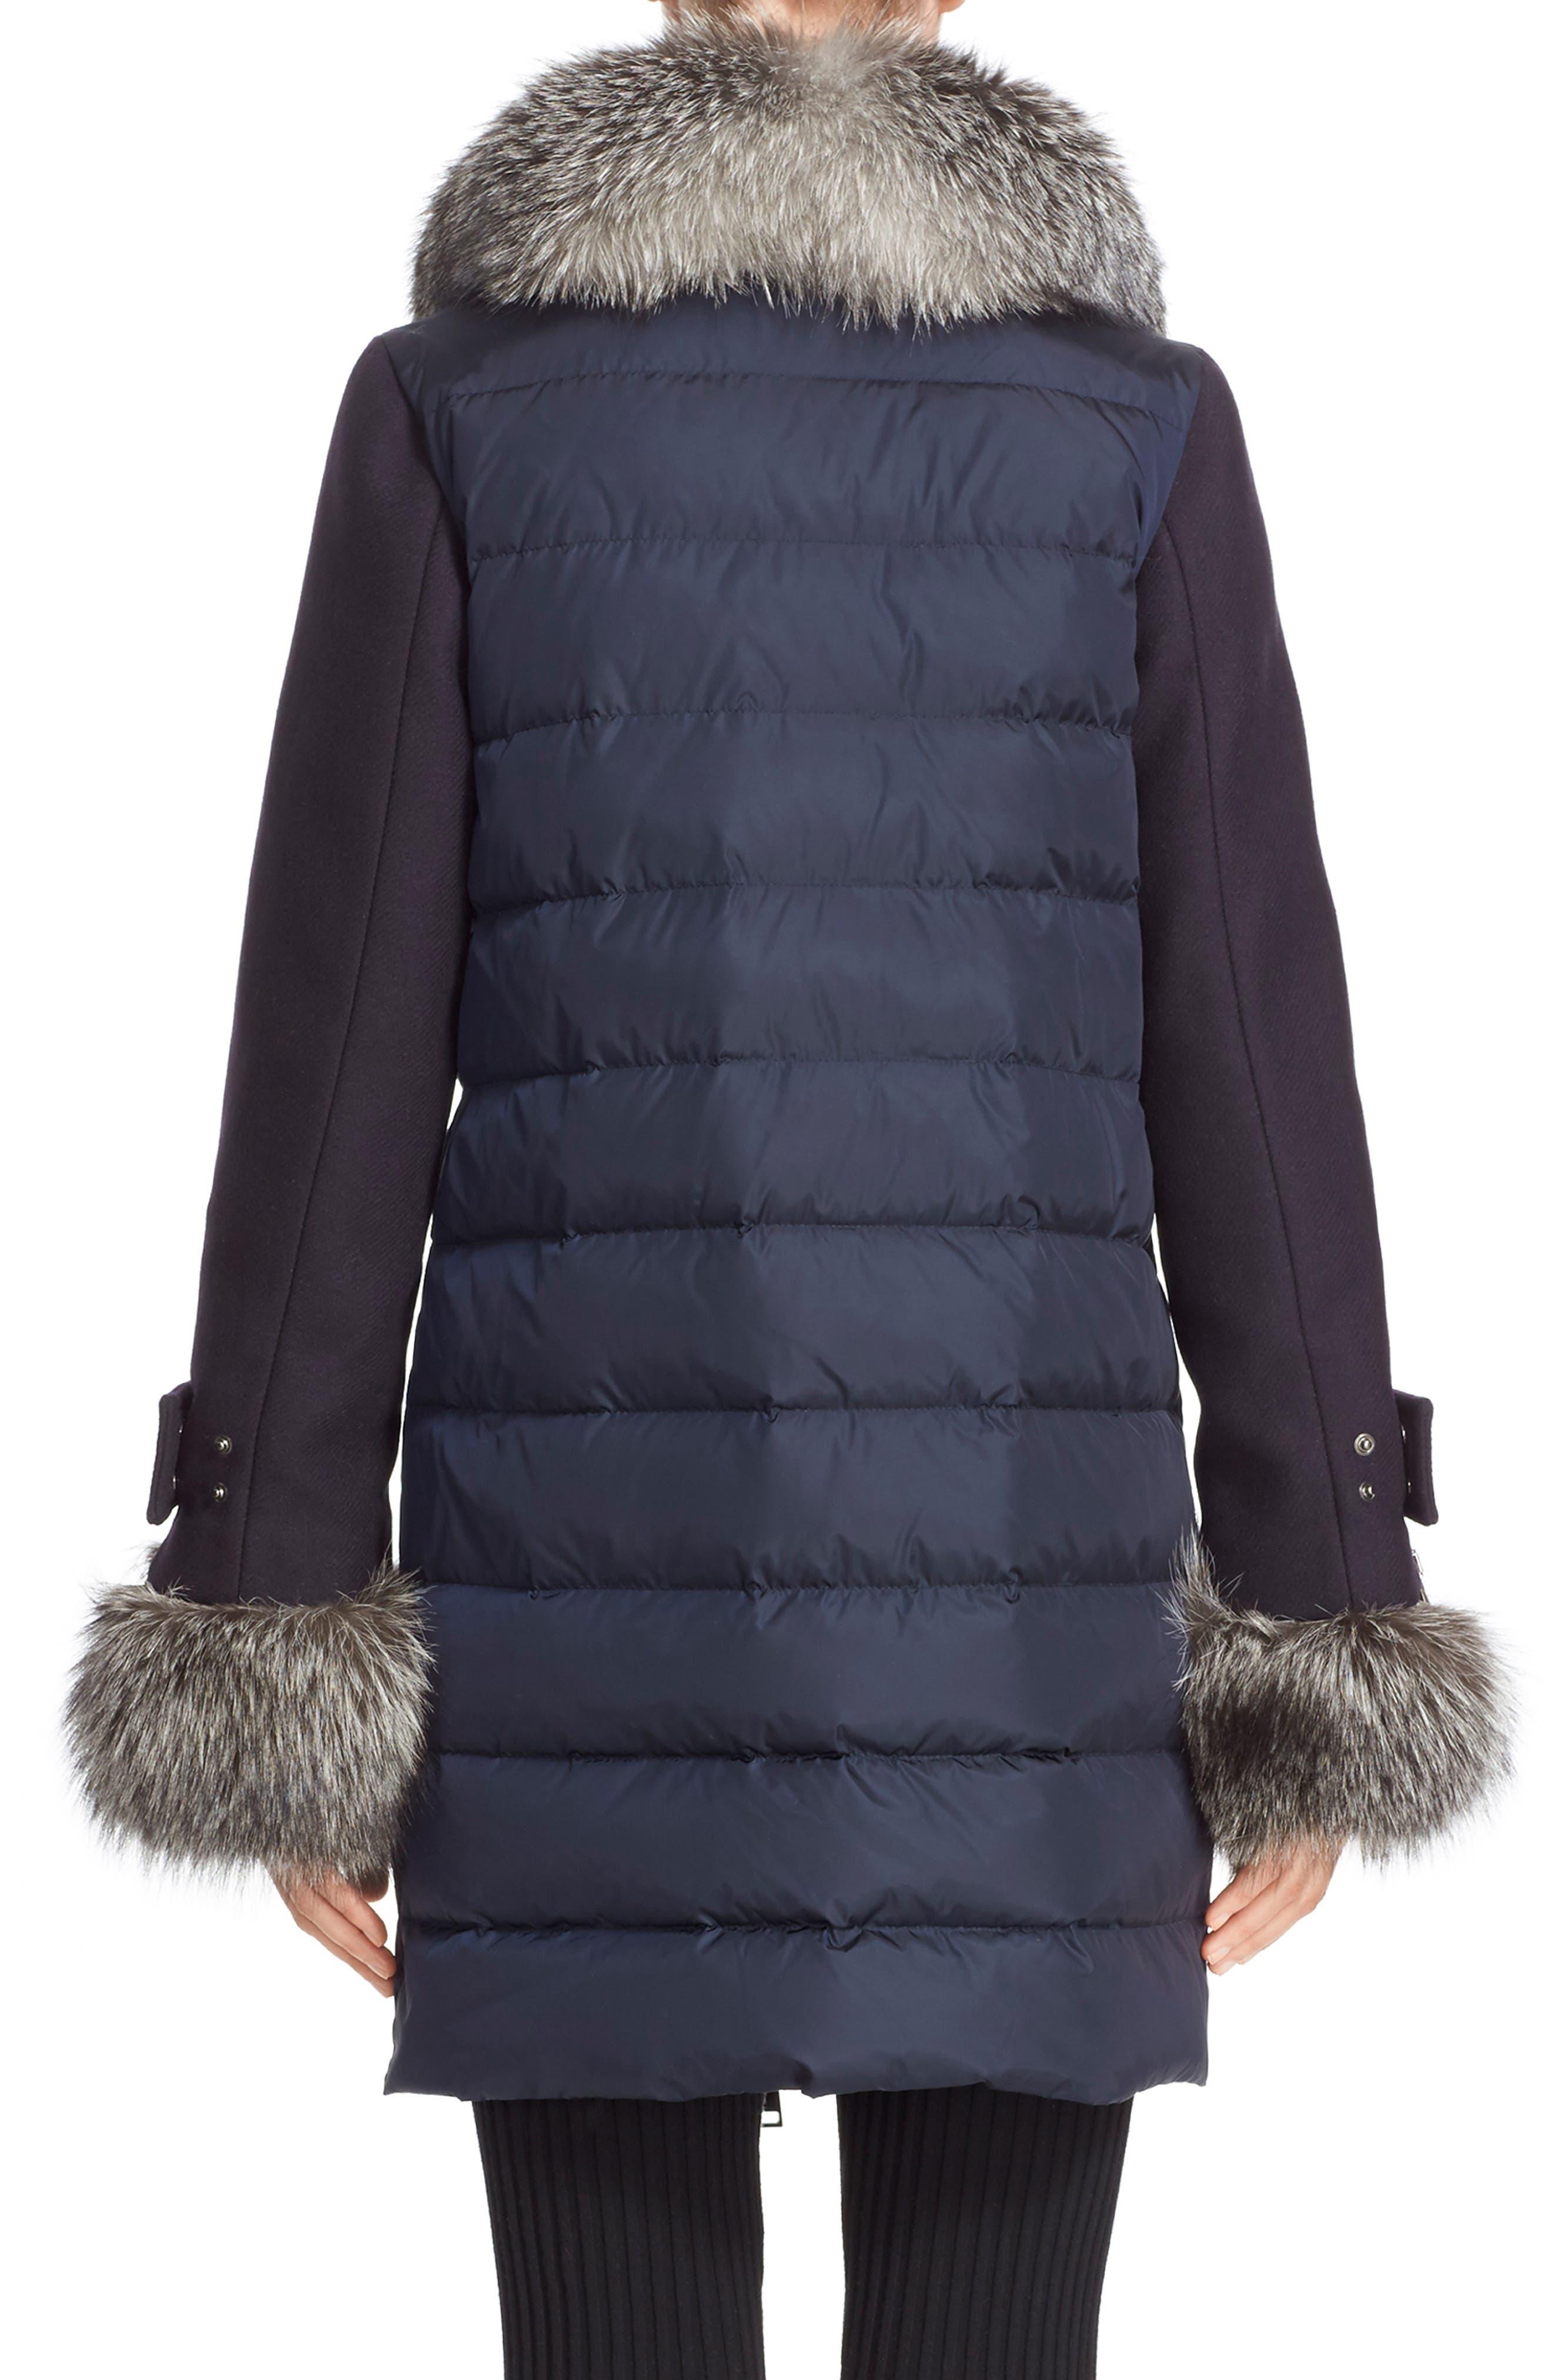 'Elestoria' Two-Piece Down Puffer Coat with Genuine Fox Fur Trim,                             Alternate thumbnail 2, color,                             419